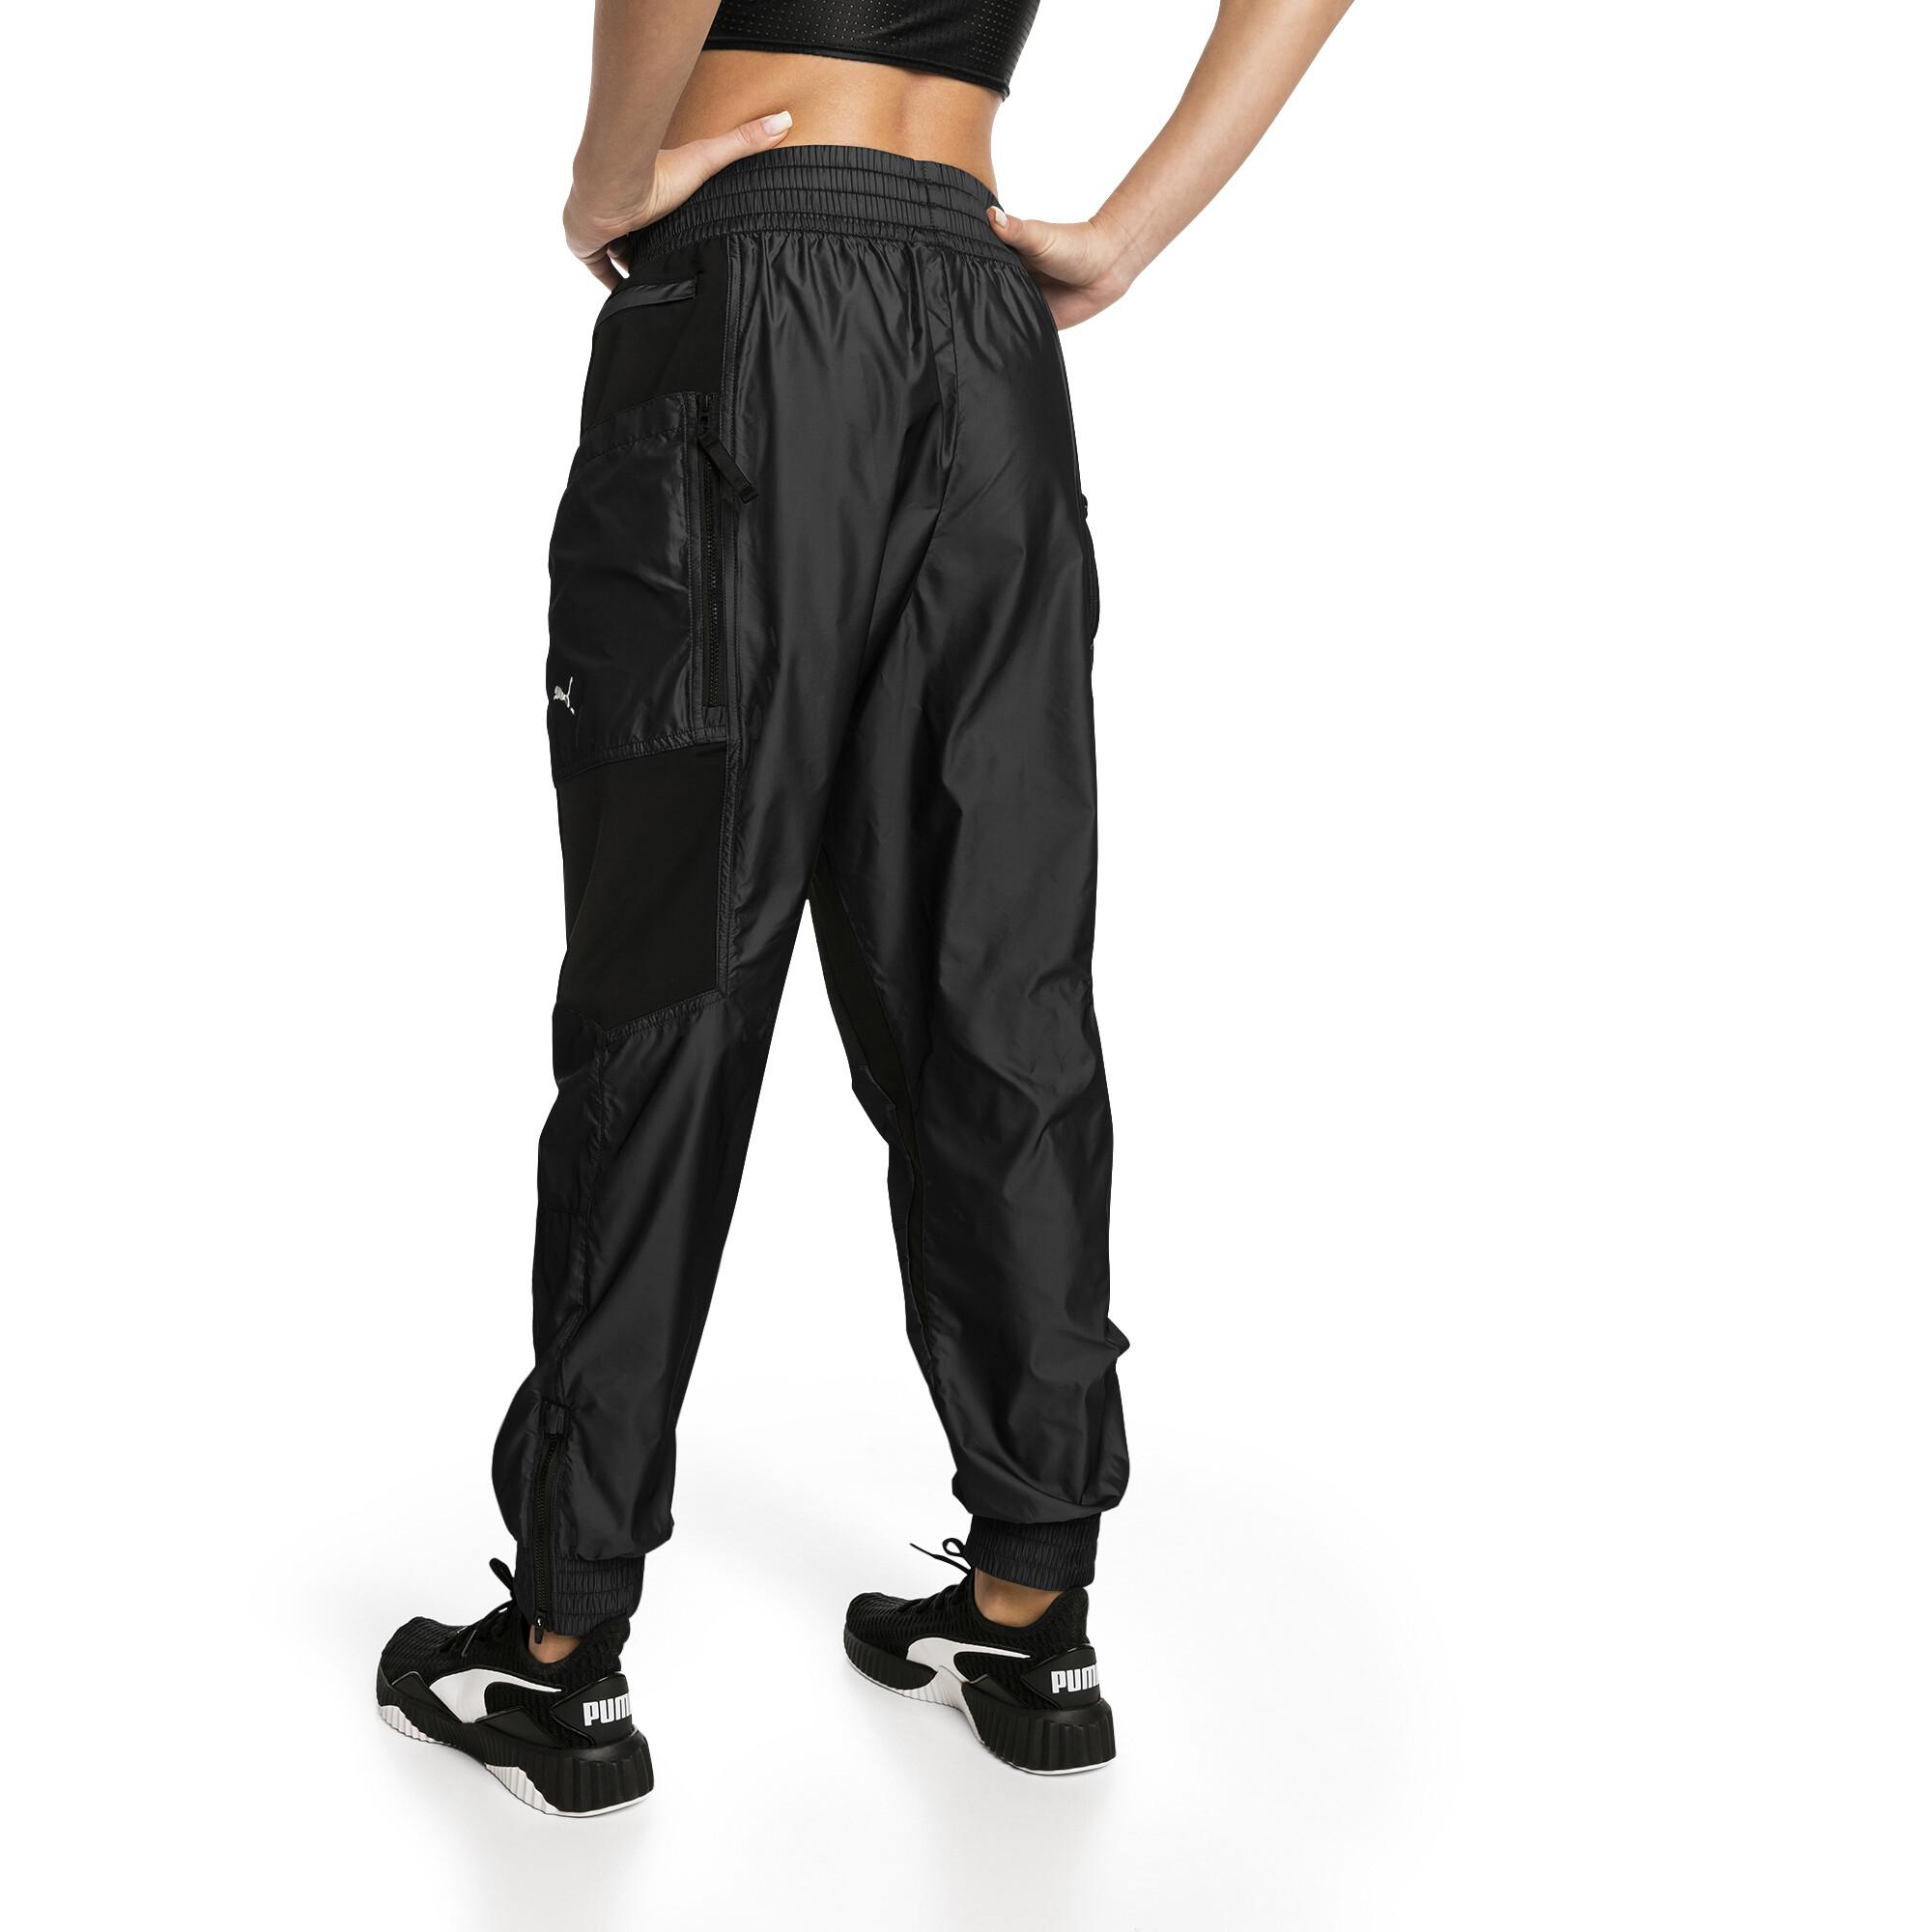 Image Puma Cosmic Knitted Women's Training Pants #2